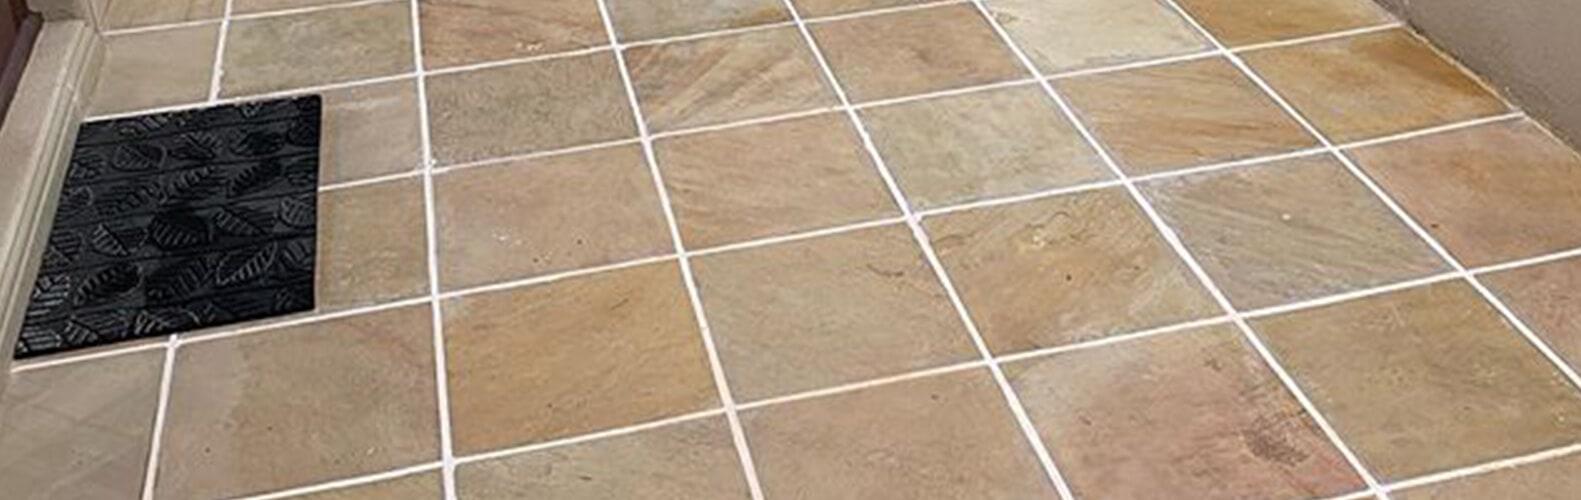 Tile Regrouting 01